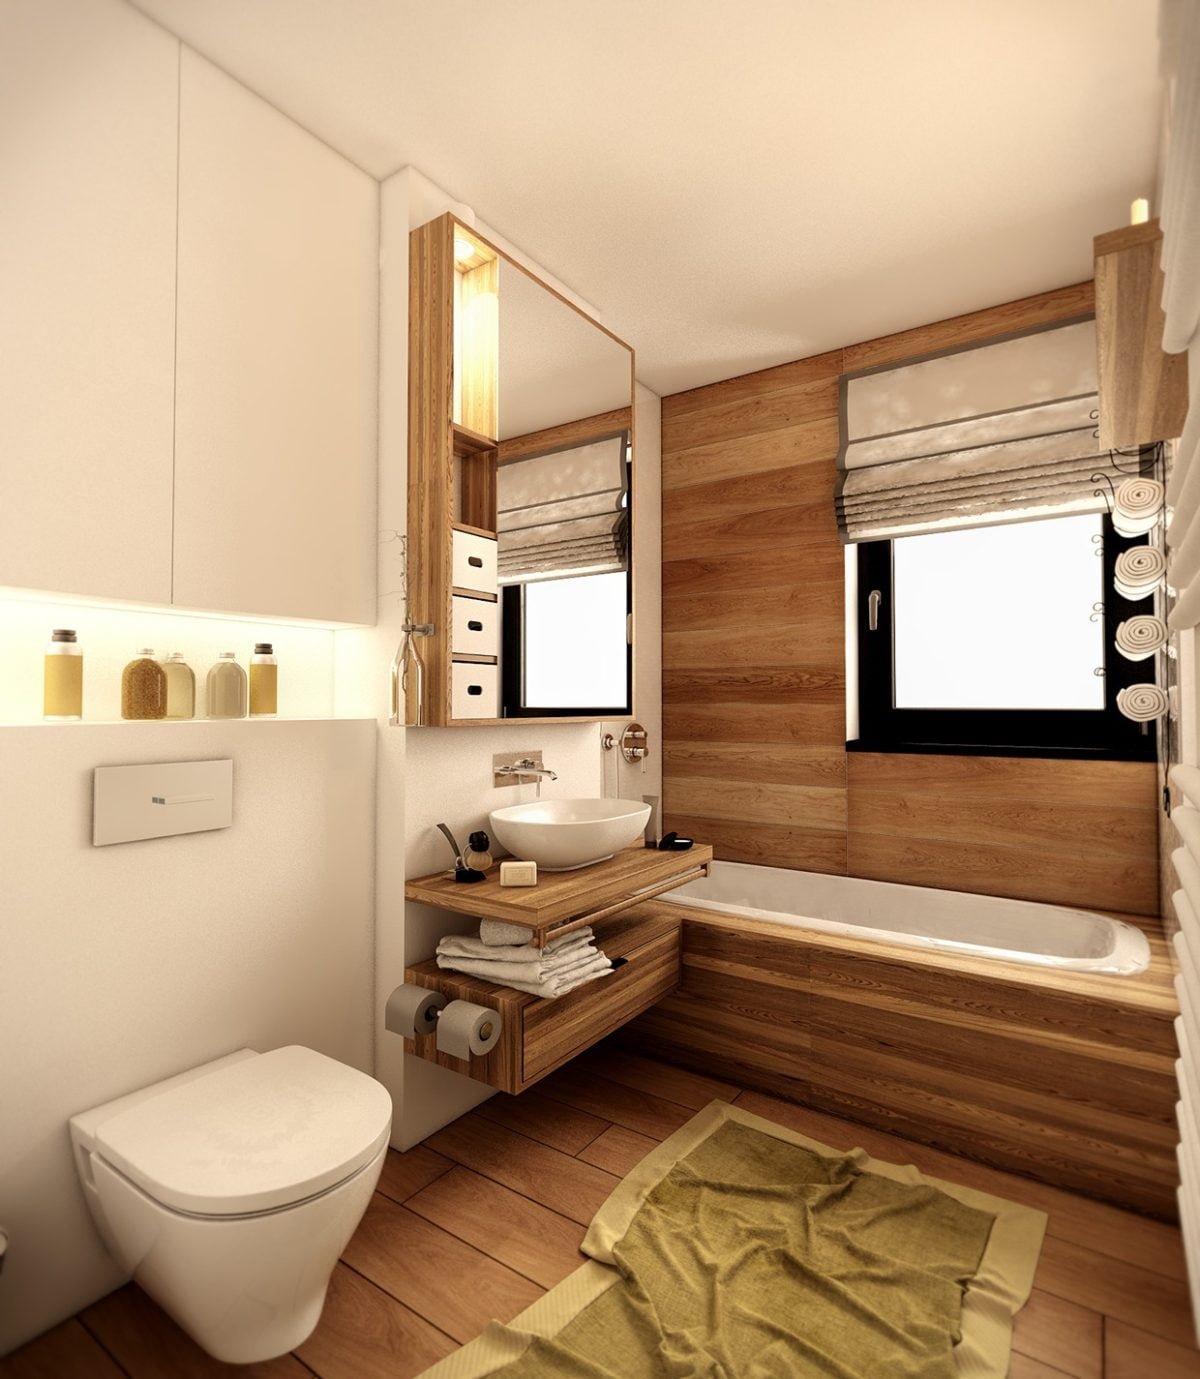 19wood-panel-bathroom-mau-nha-thiet-ke-go-doc-dao